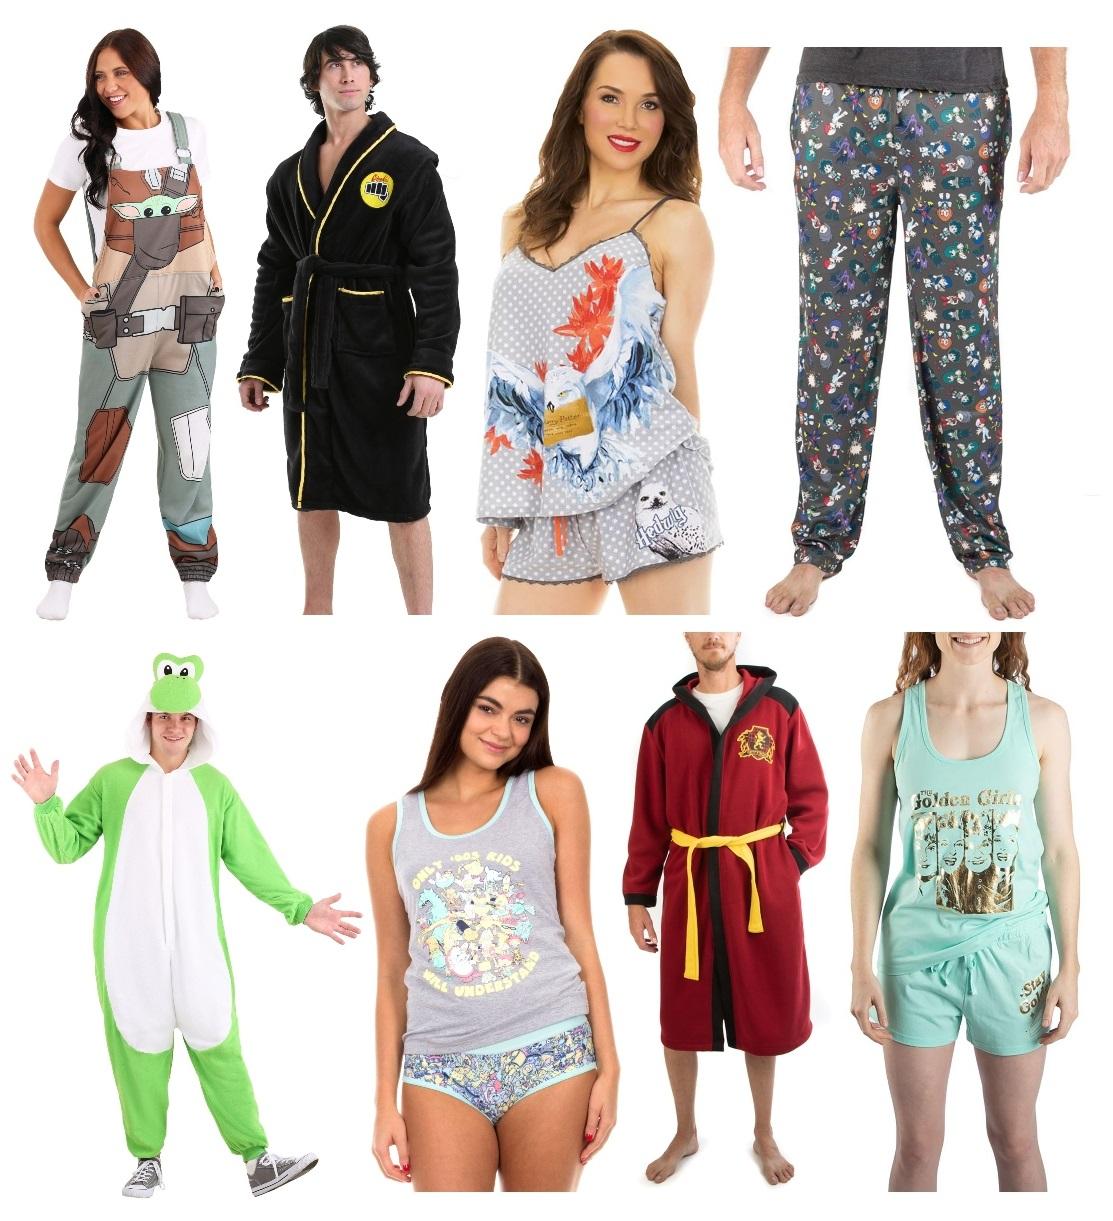 Dorm Room Loungewear